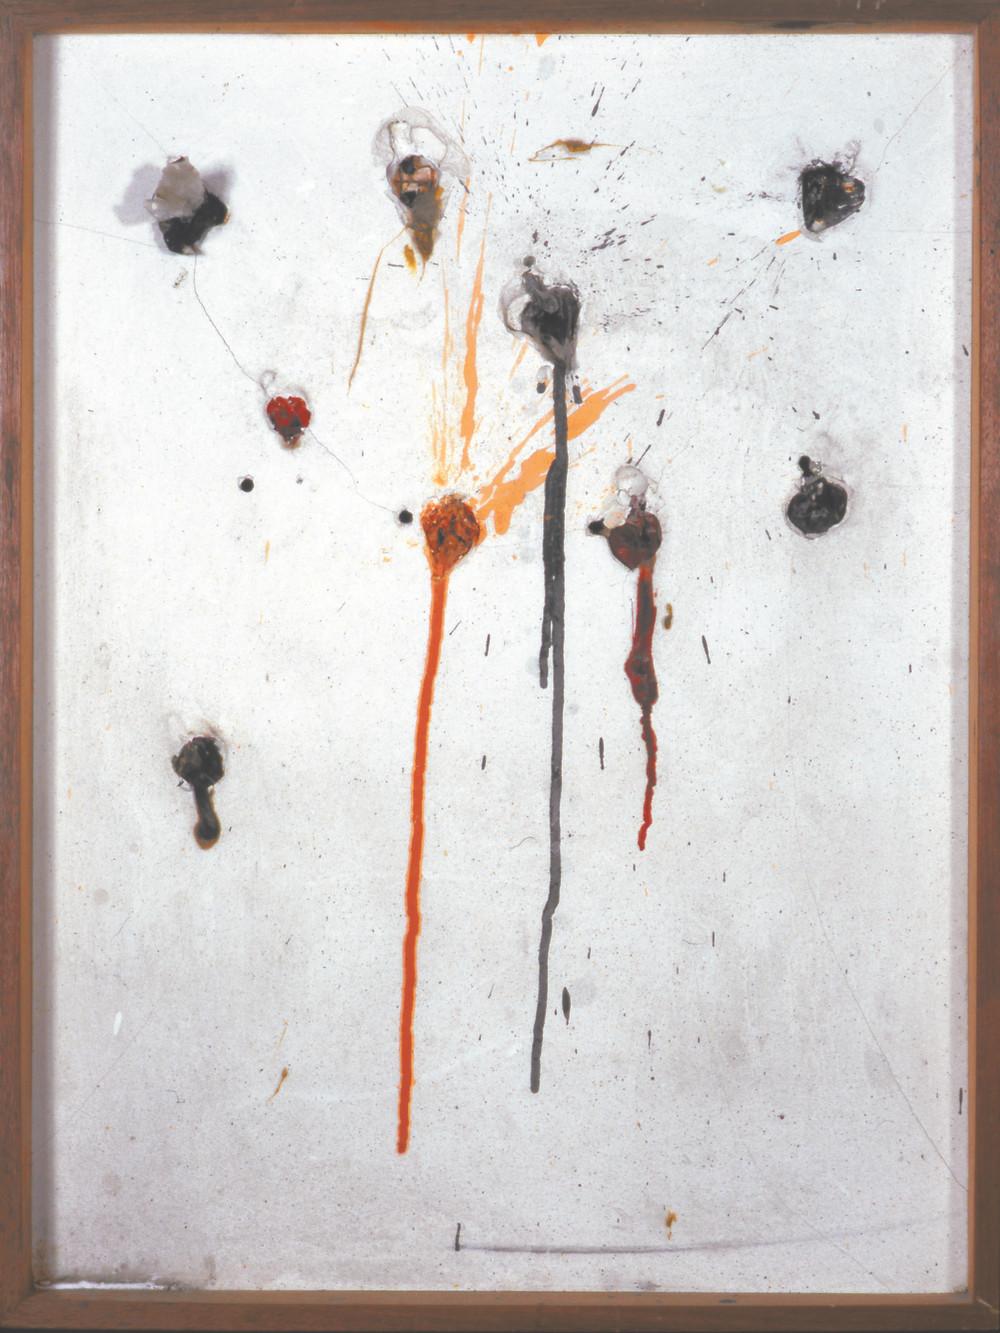 "Niki de Saint Phalle. Tir neuf trous—Edition MAT. 1964. Paint in plastic bags, embedded in plaster on  wood. 27 15/16 × 20 7/8"" (71 × 53.1 cm). Photo: NCAF Archives. © 2021 Niki Charitable Art Foundation"